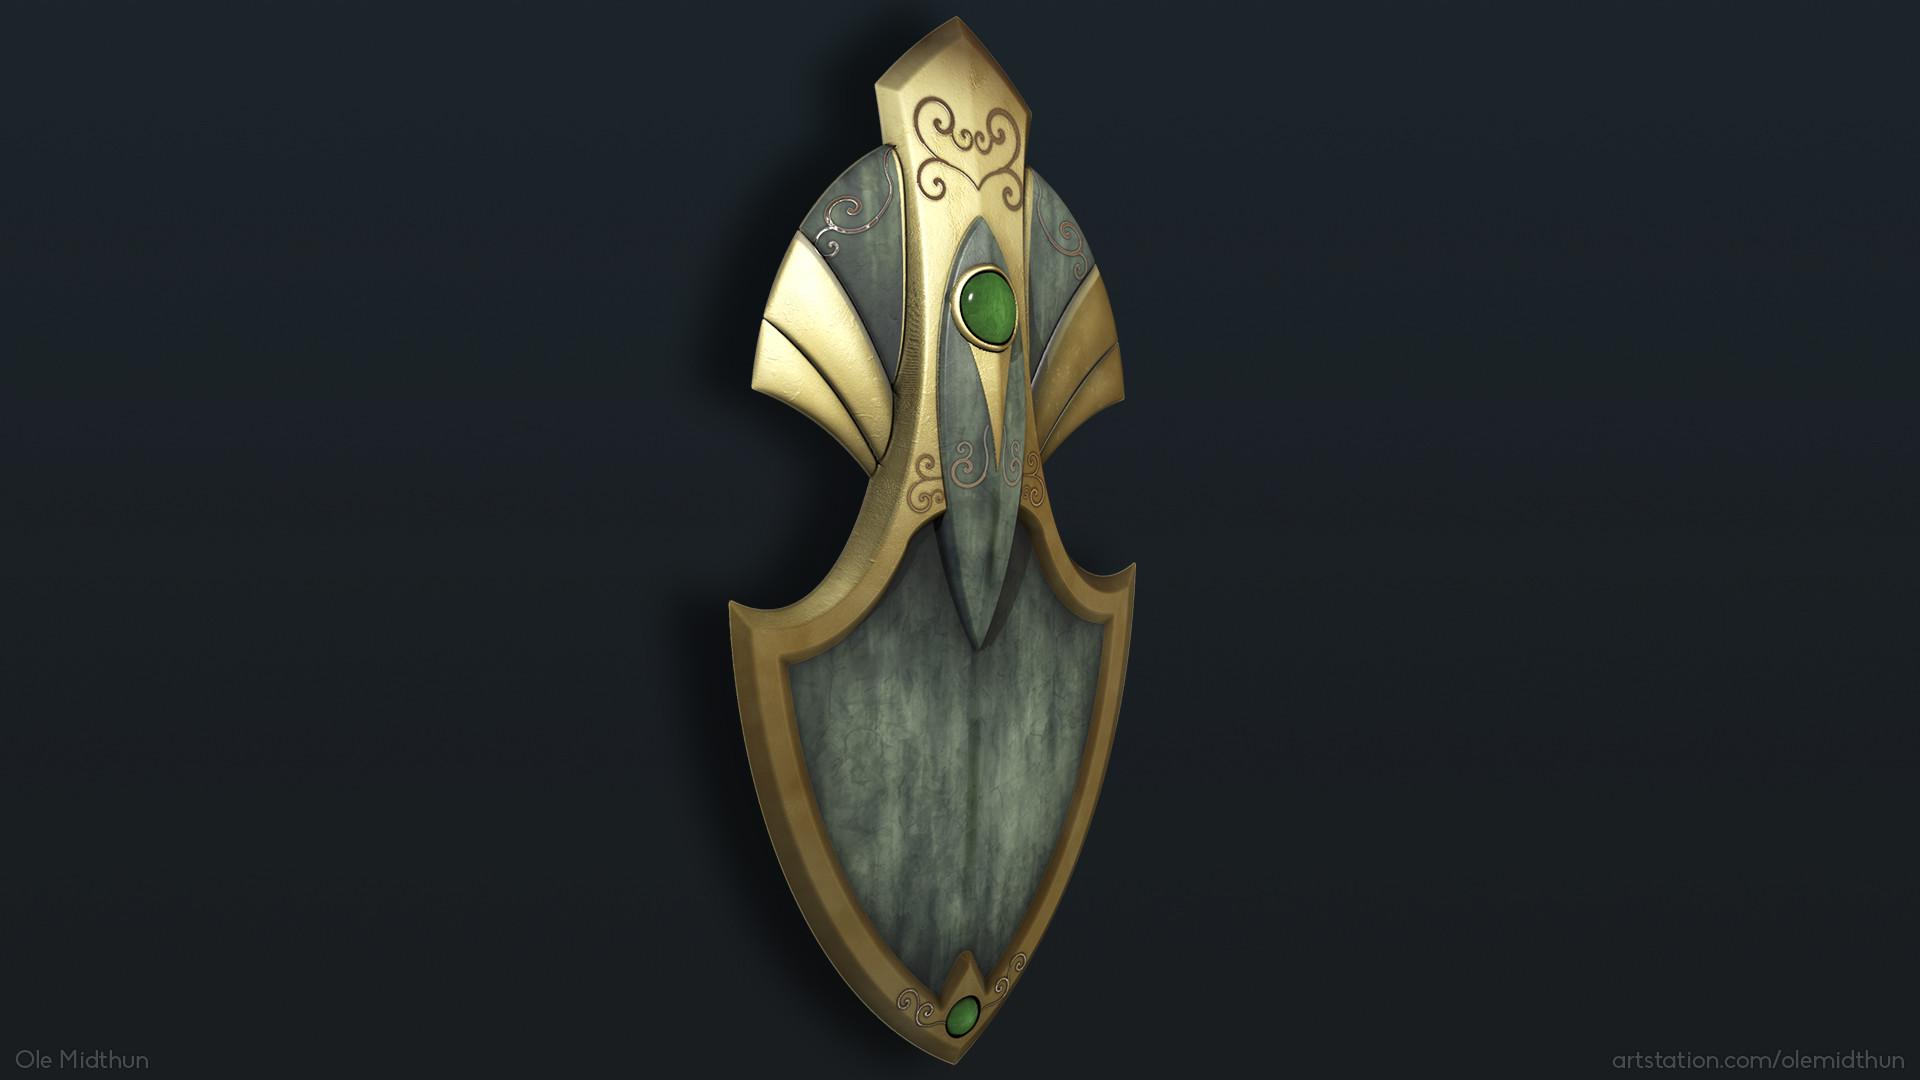 Ole midthun elven shield 2